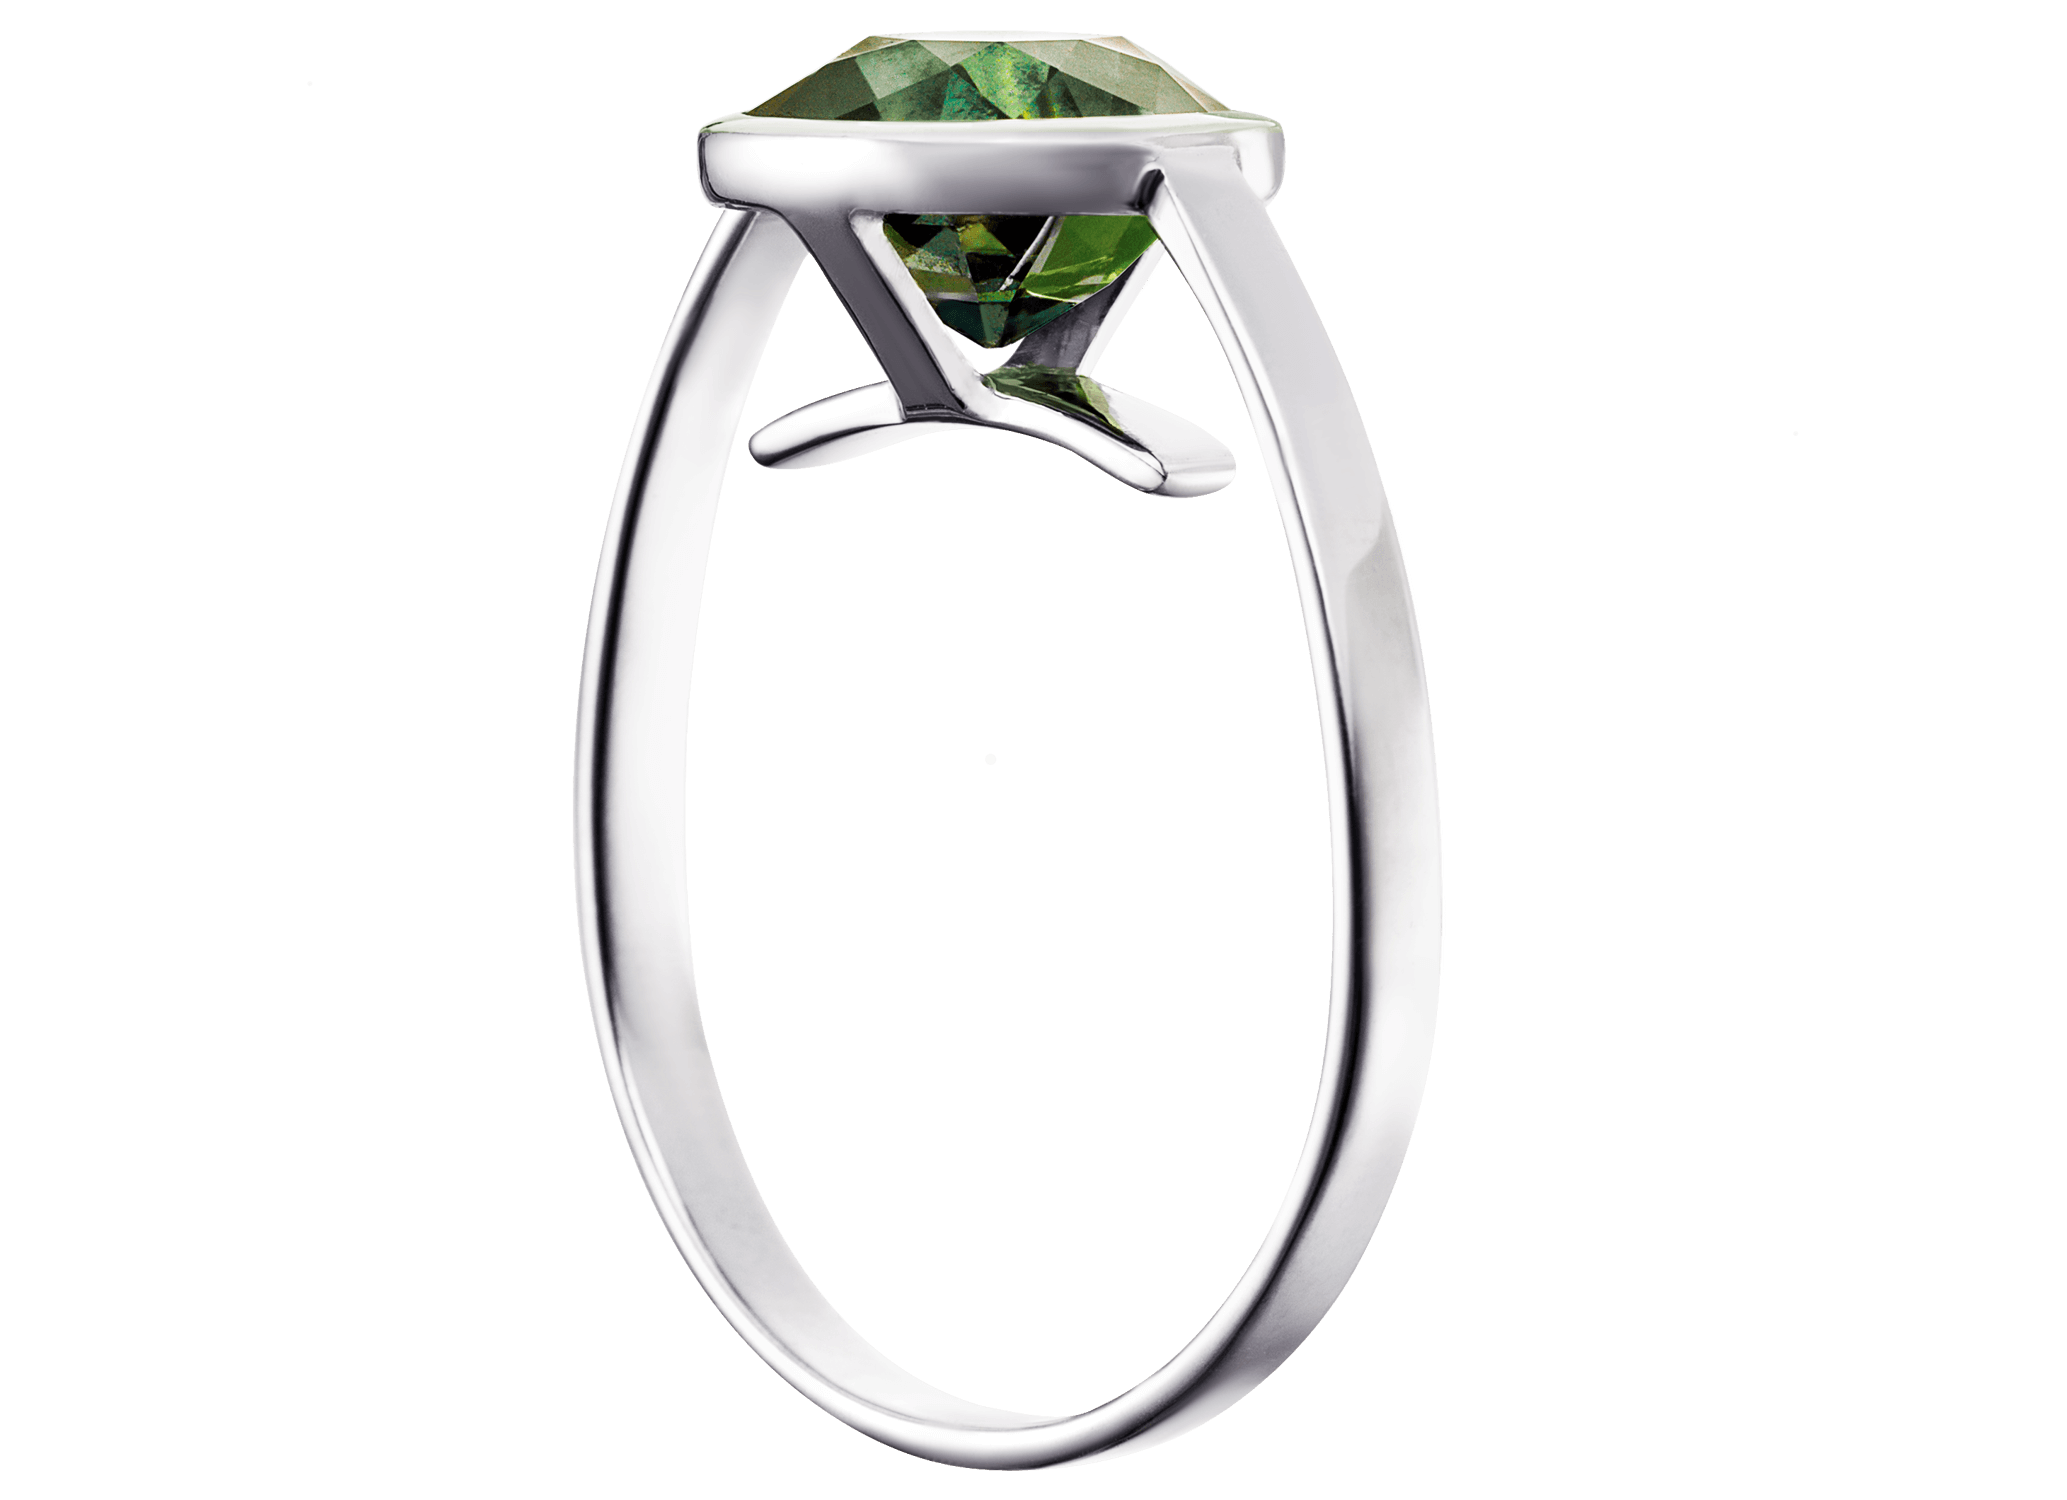 Bague Cha or blanc et Saphir vert coussin 3,01 carats perspective PNG web.png